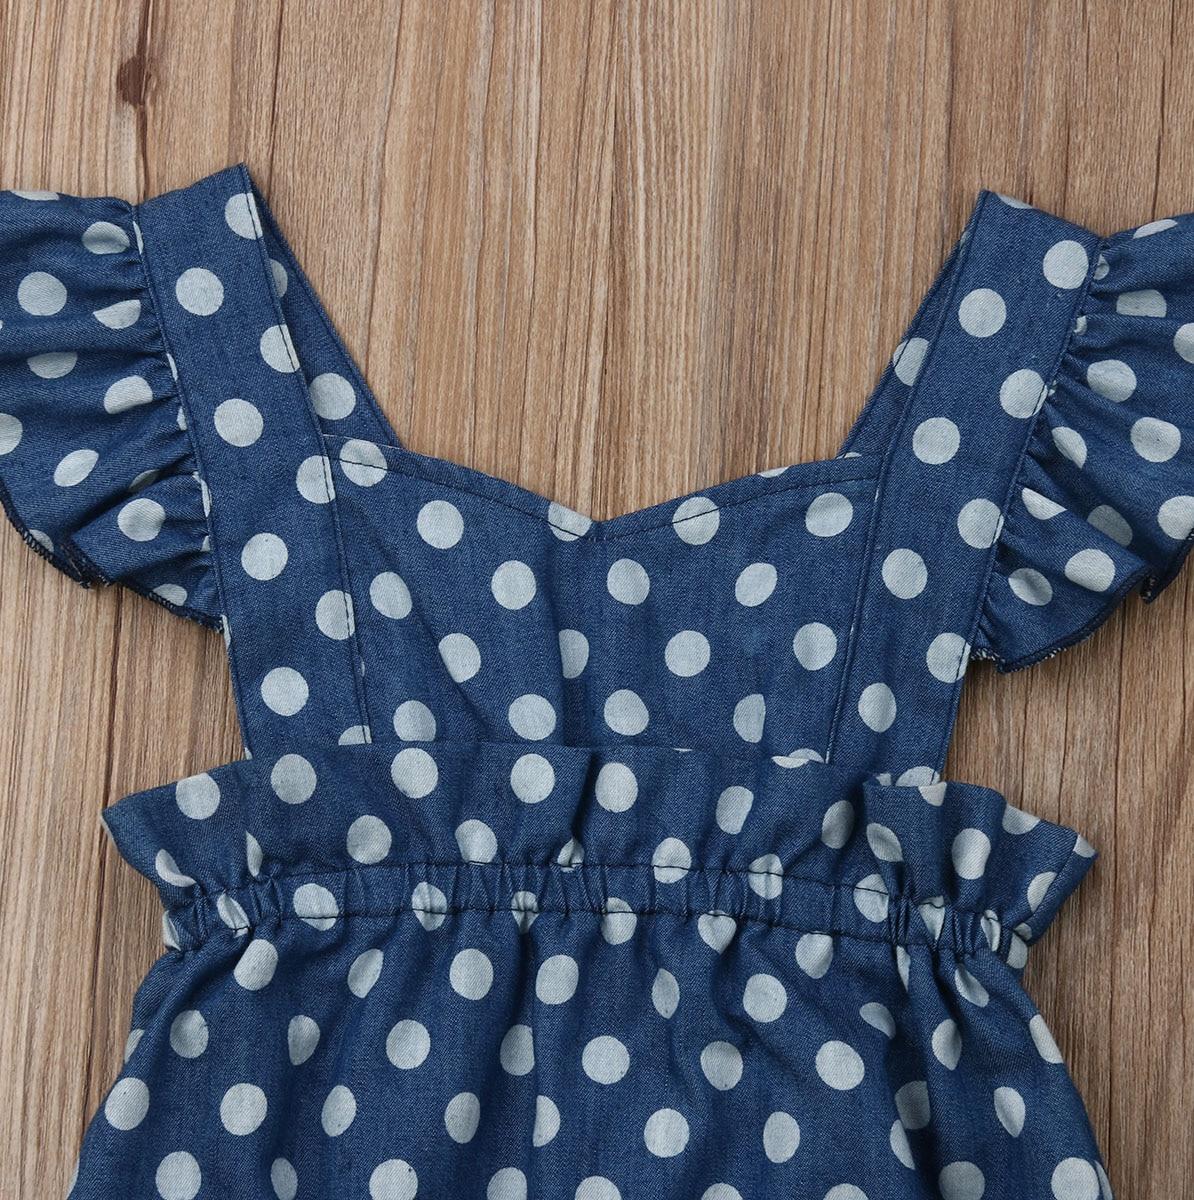 squarex Baby Cactus Floral Print Vest Sleeveless Backless Romper Jumpsuit